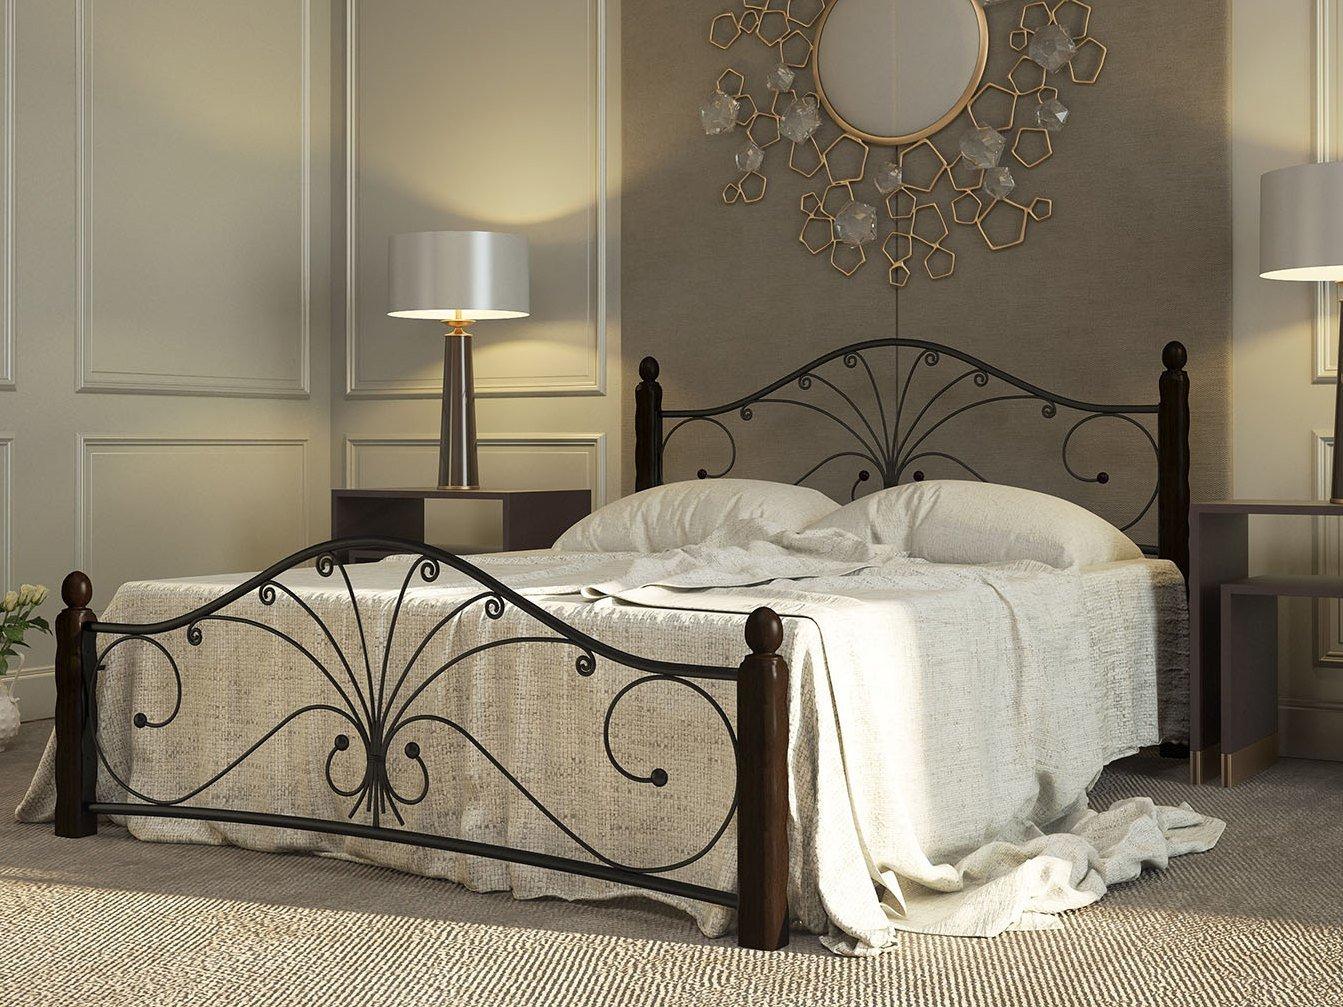 Двуспальная кровать ПМ: Форвард-мебель Сандра 140х200 / 160х200 Черный, 1600 Х 2000 мм